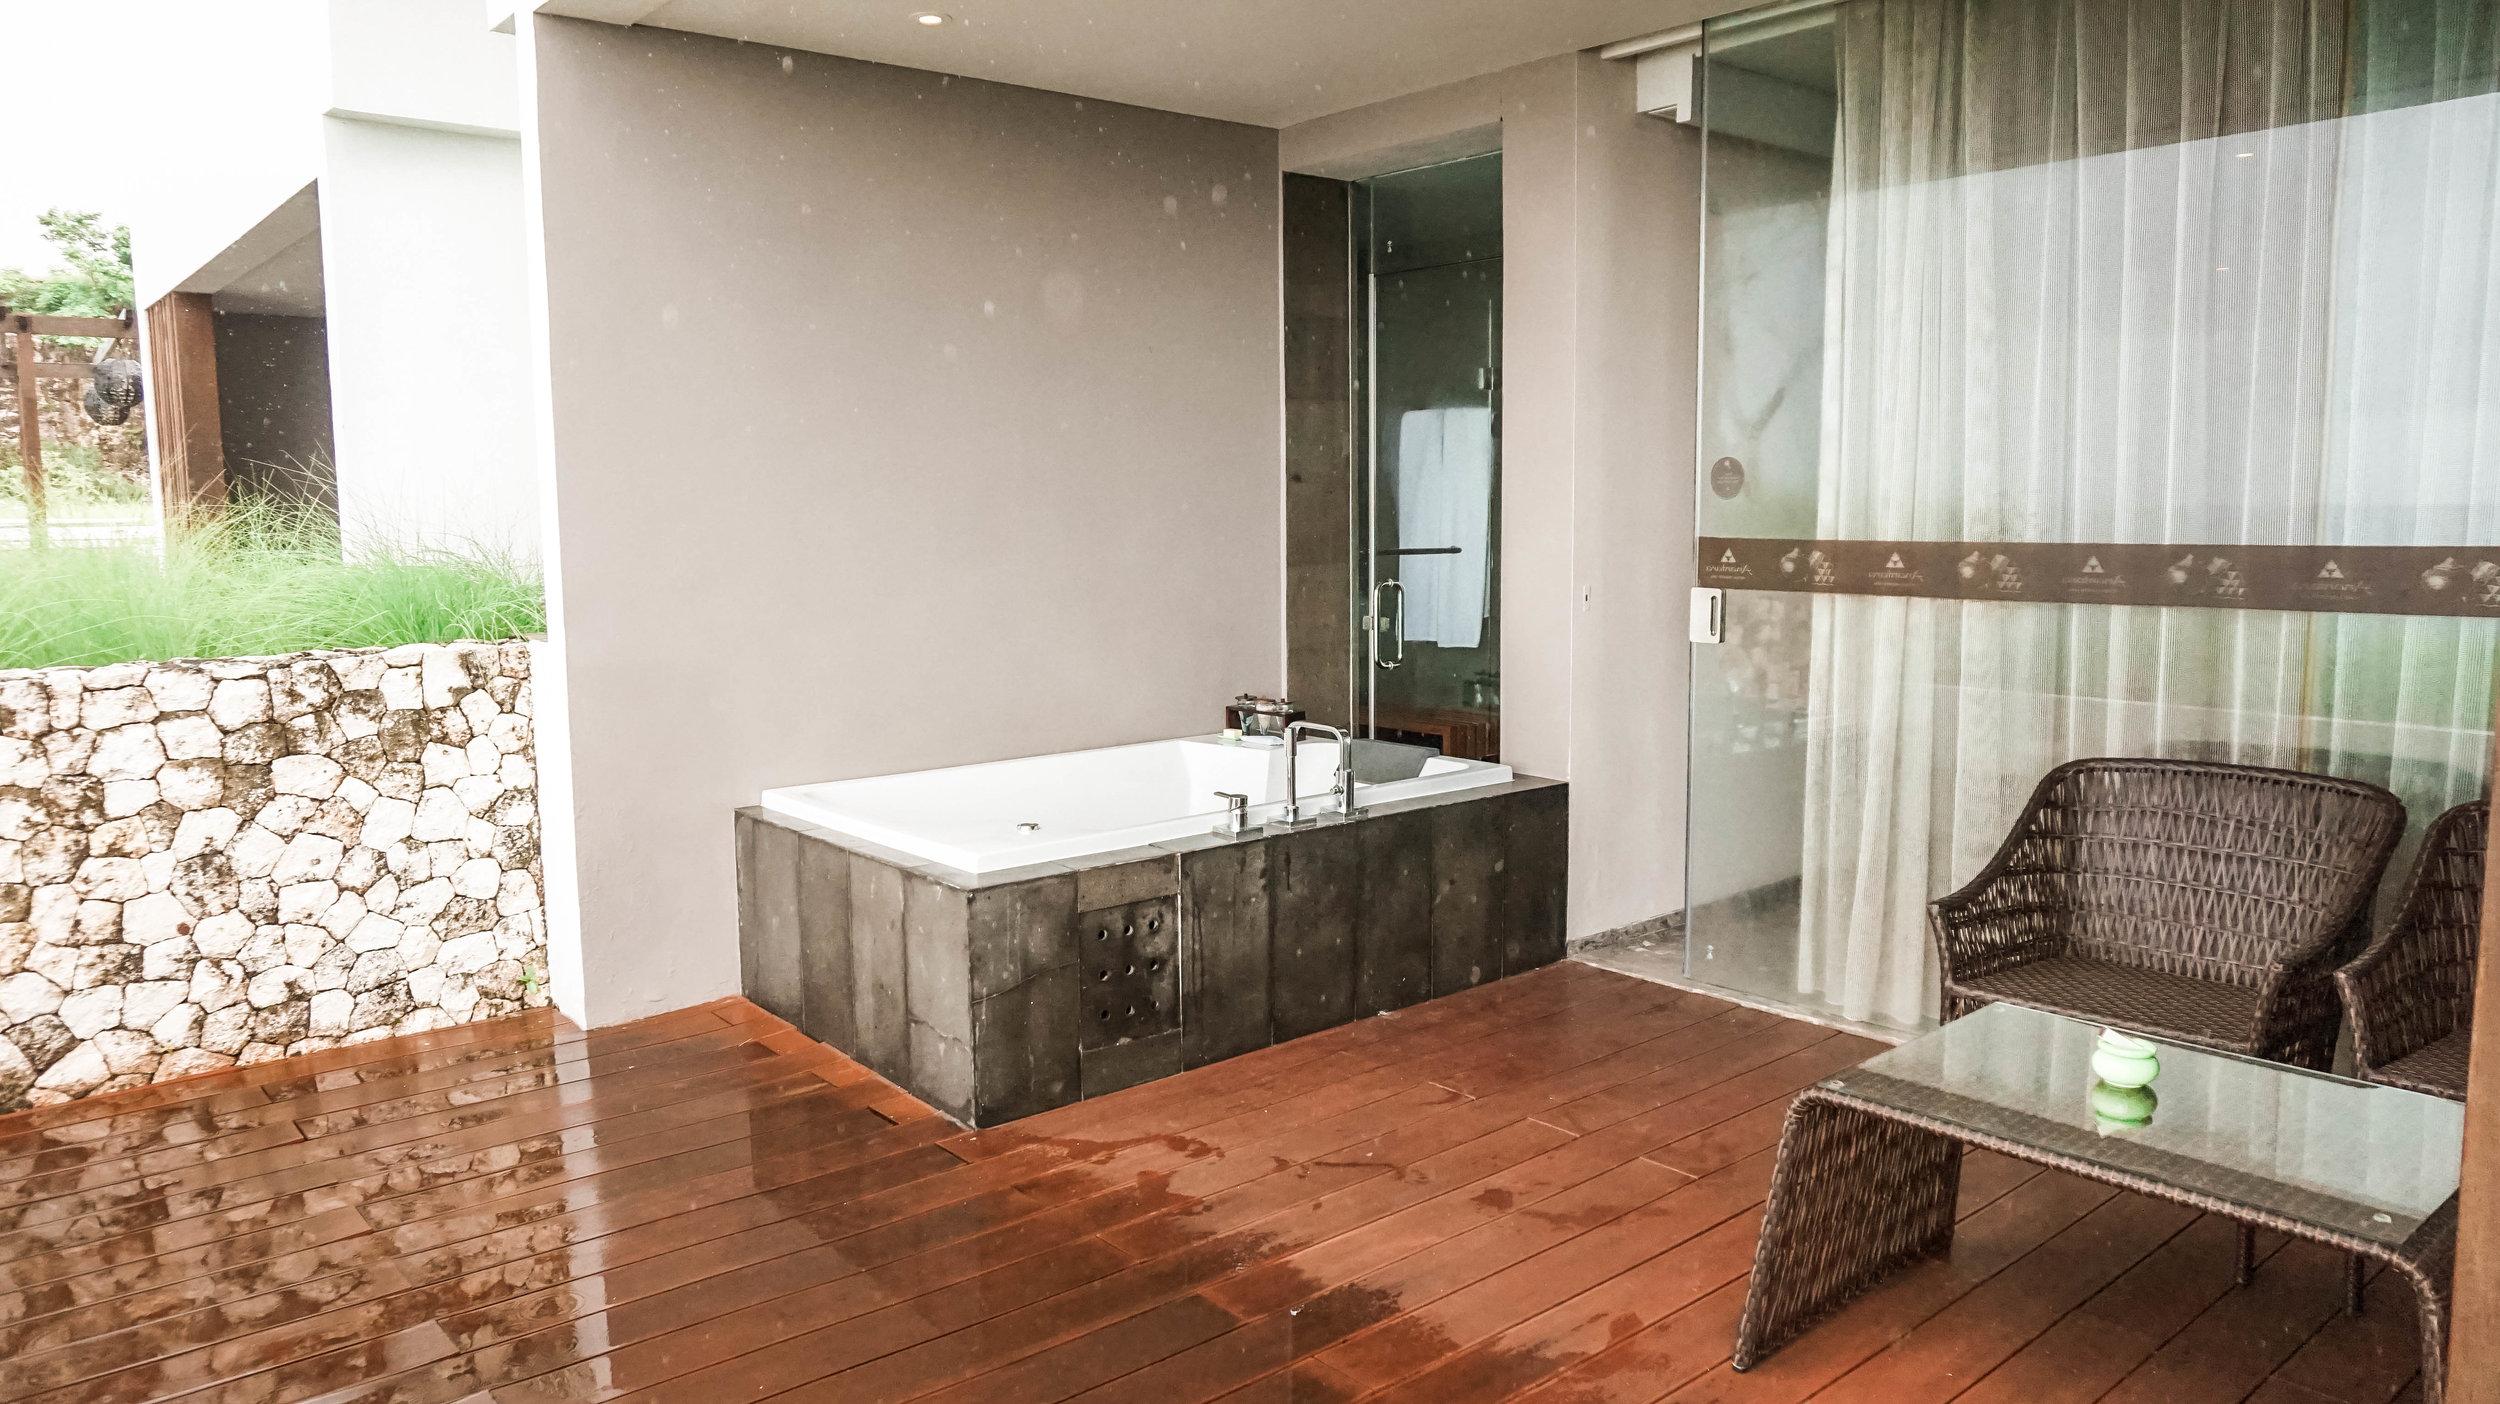 Anantara-uluwatu-oceanfront-suite-2018.jpg